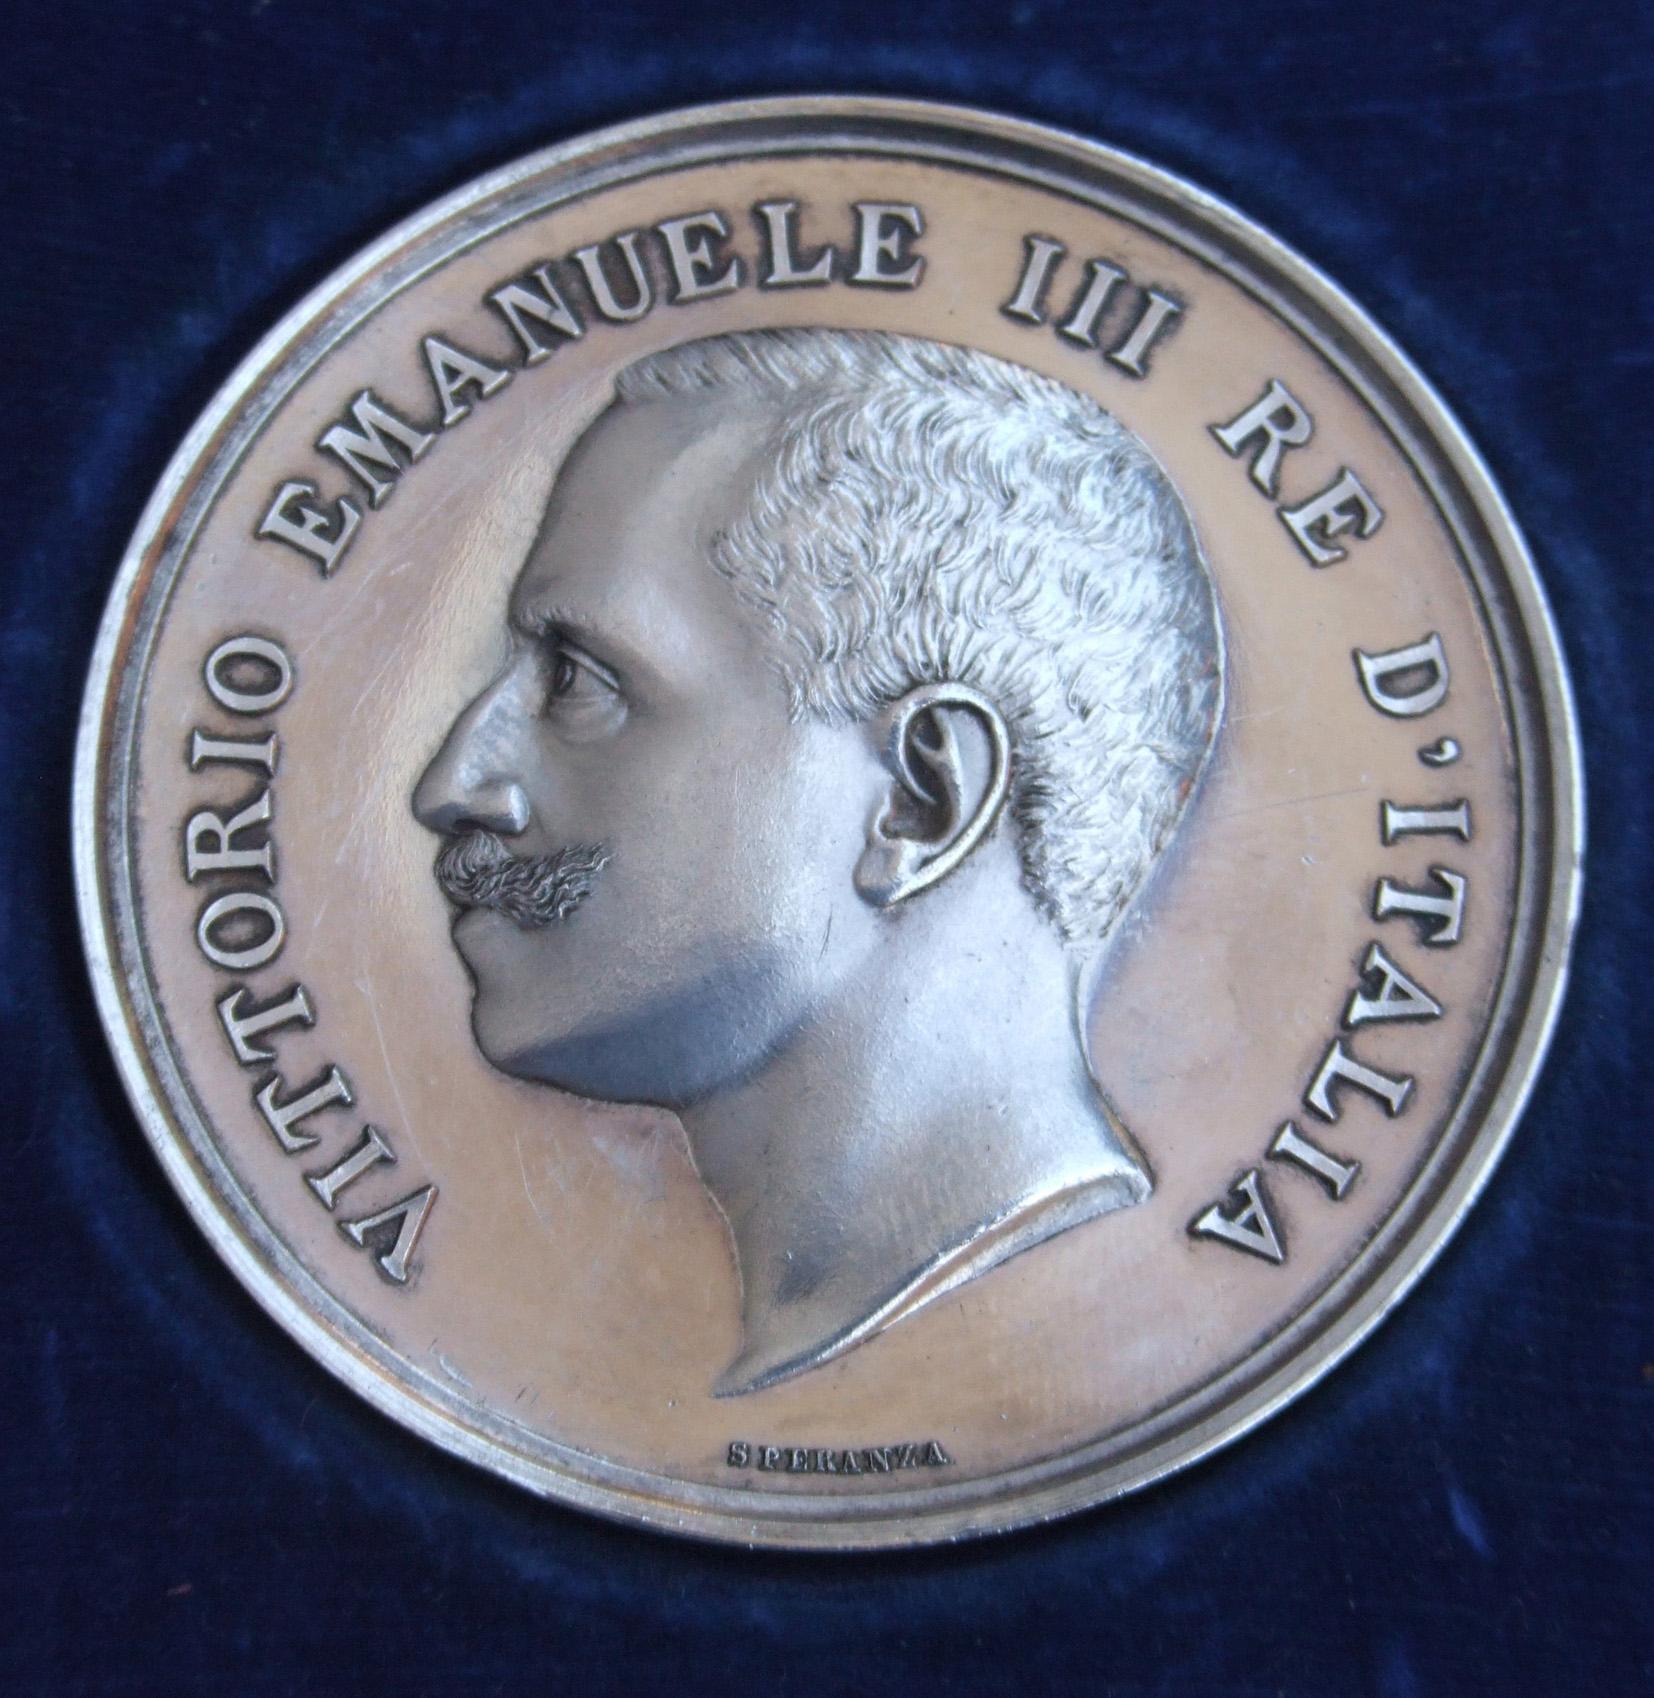 1909 03 28 Medaglia Du0027argento Per Premio Pittura Carlo Barbieri